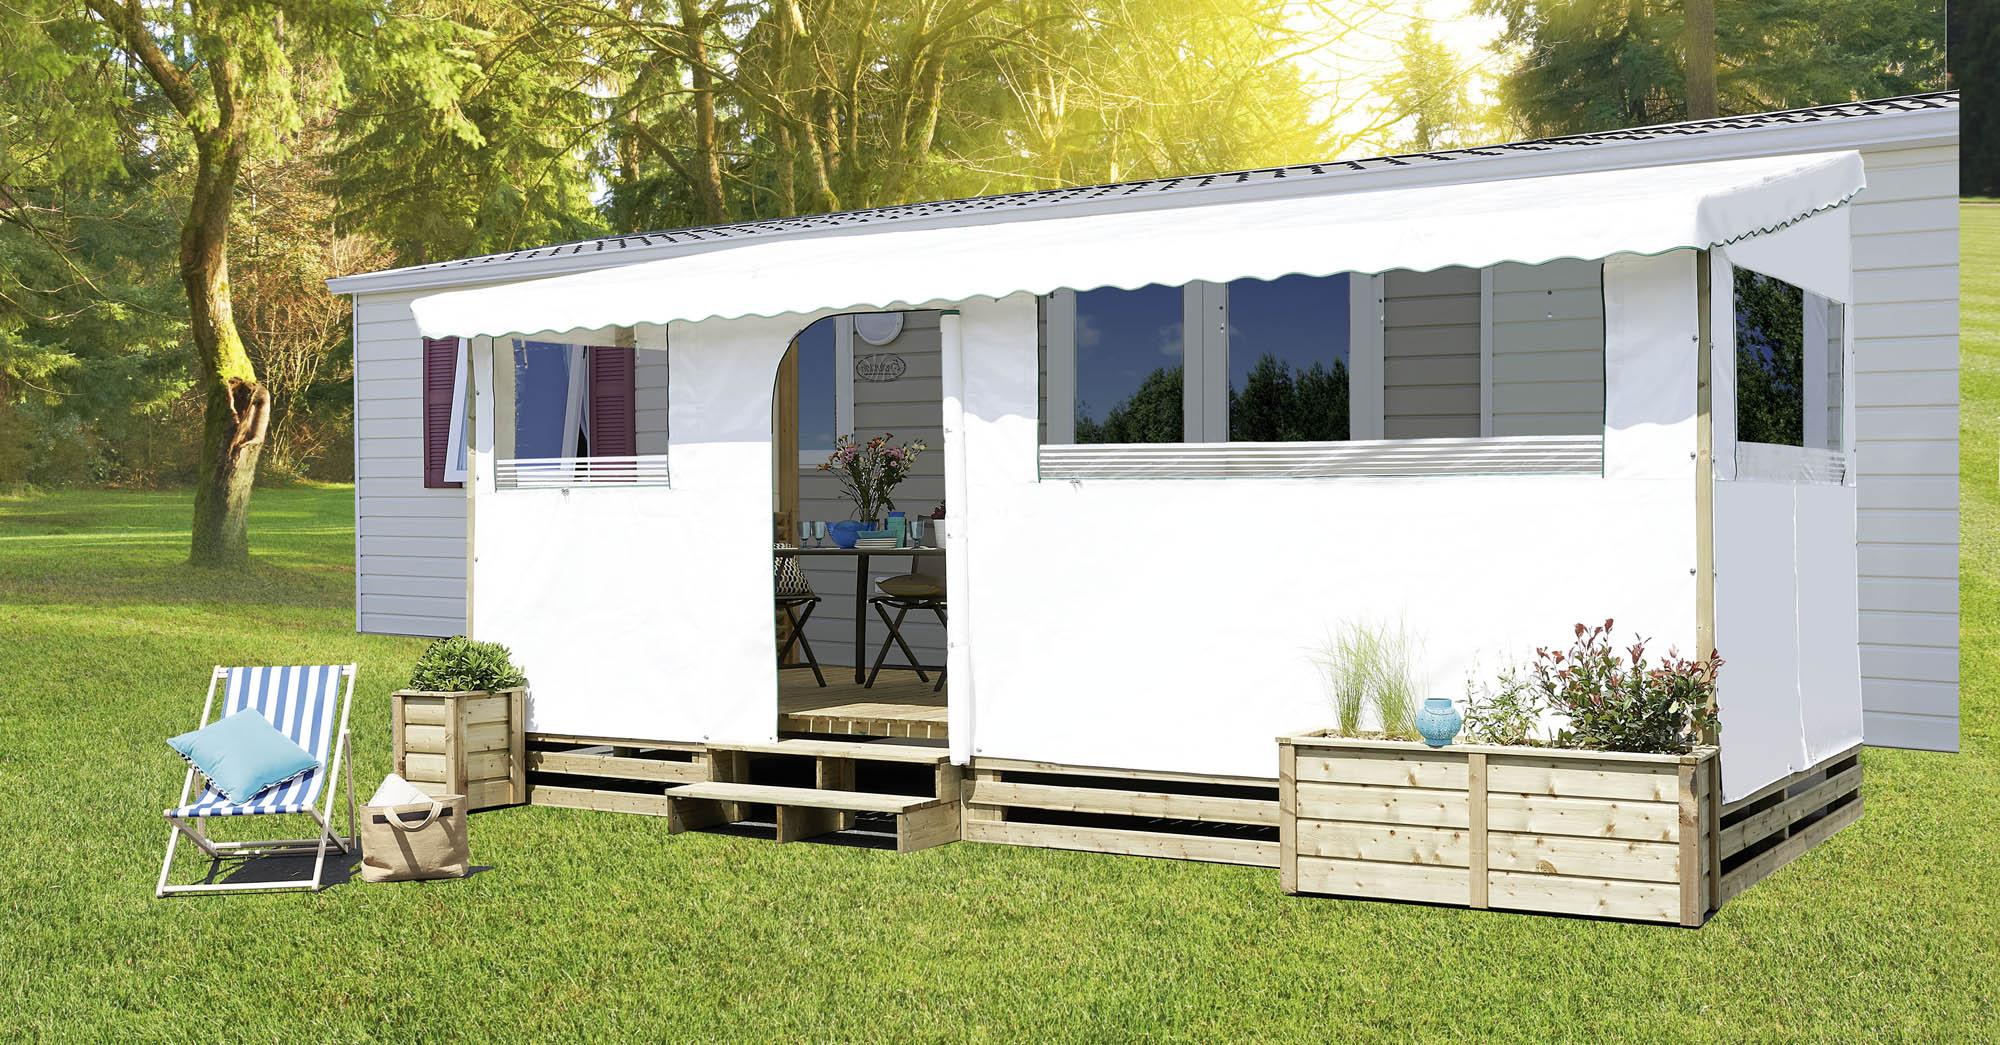 toile pour terrasse de mobil home. Black Bedroom Furniture Sets. Home Design Ideas